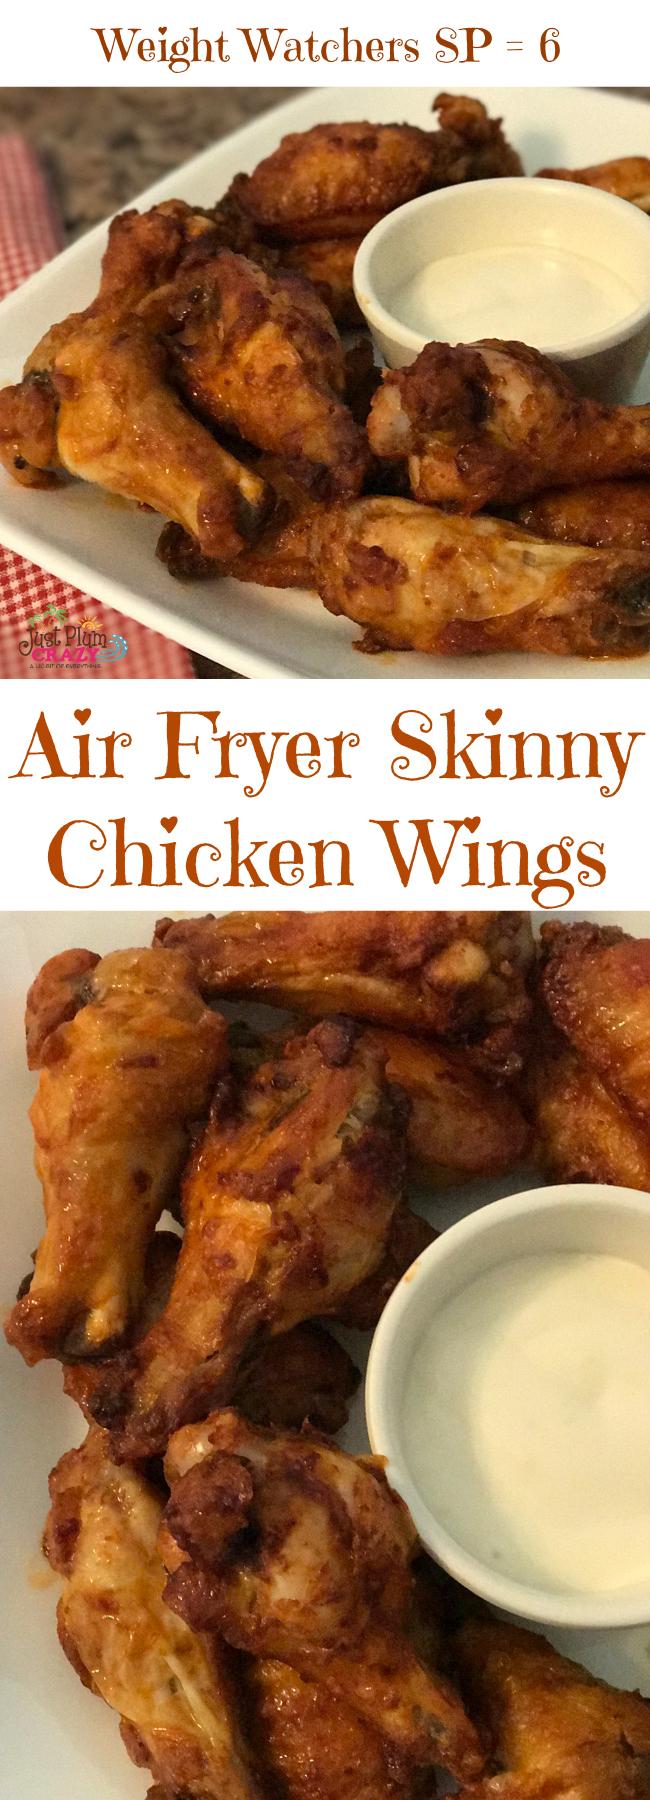 http://plumcrazyaboutcoupons.com/wp-content/uploads/2017/04/Air-Fryer-Skinny-Chicken-Wings-Recipe-WW-SP-6-.jpg